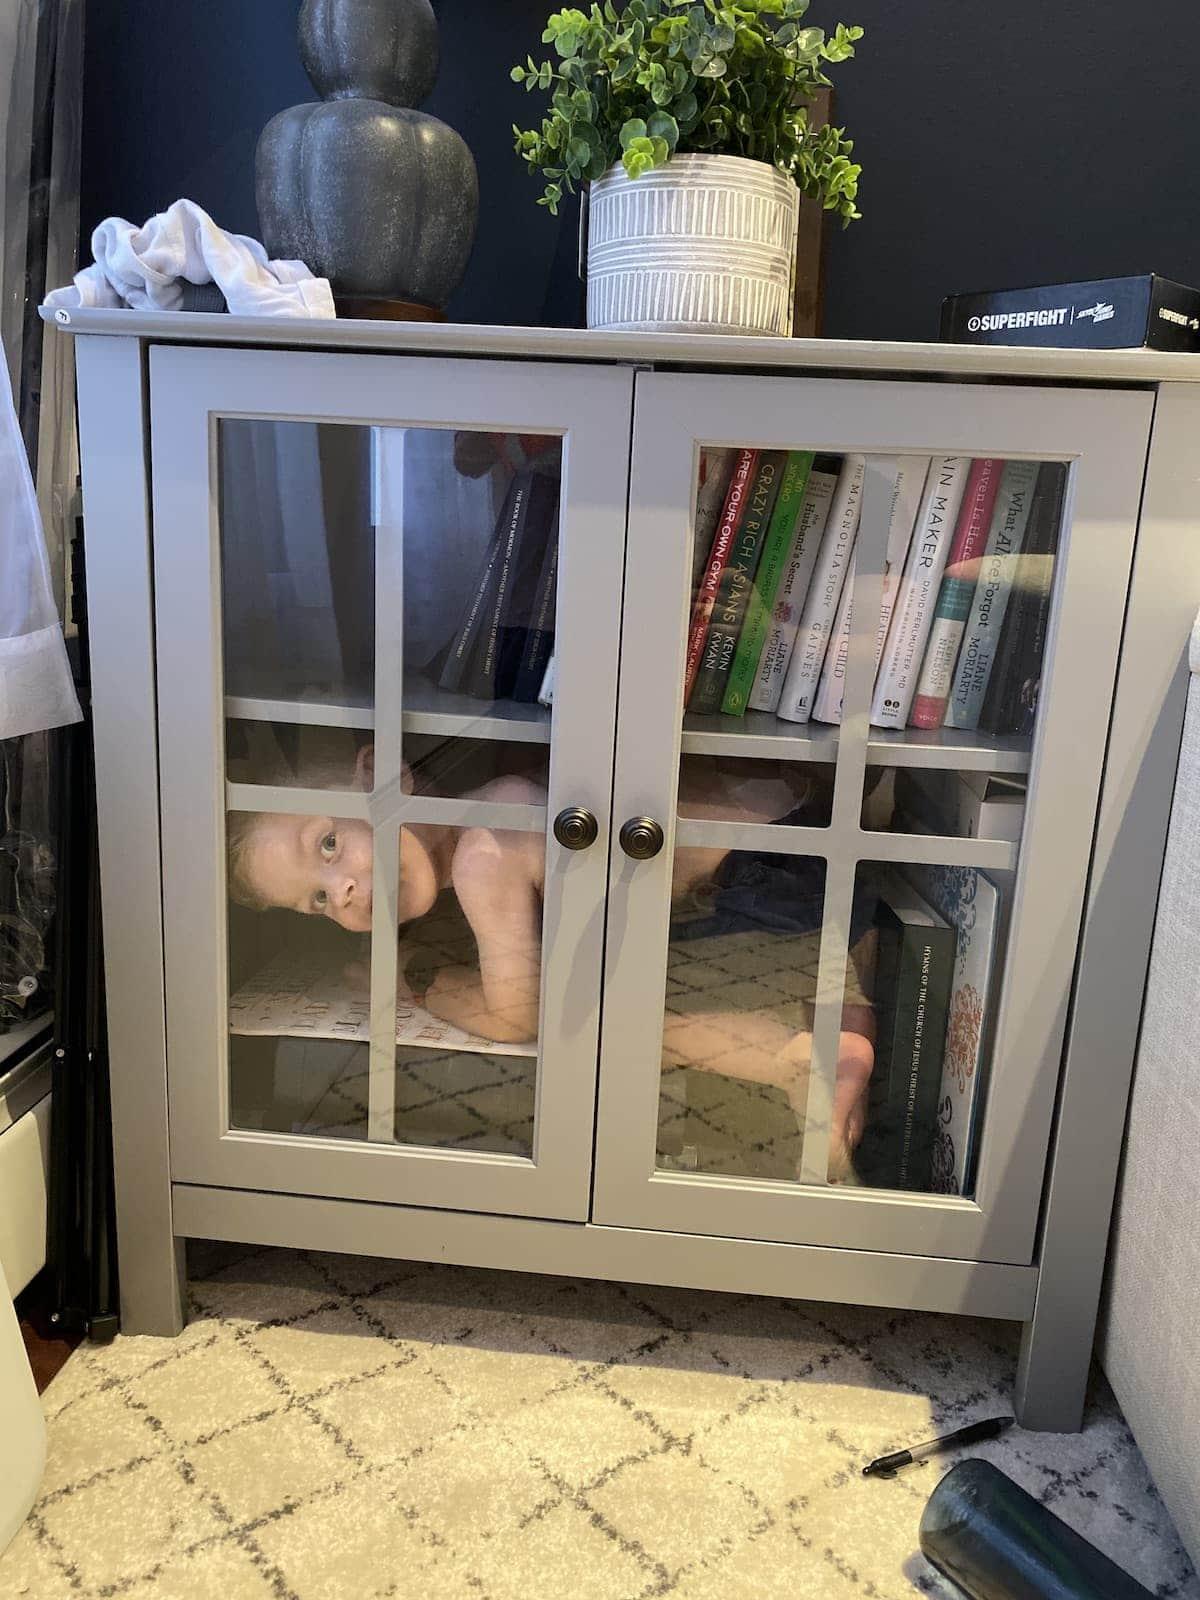 Eddie hiding in a bookshelf